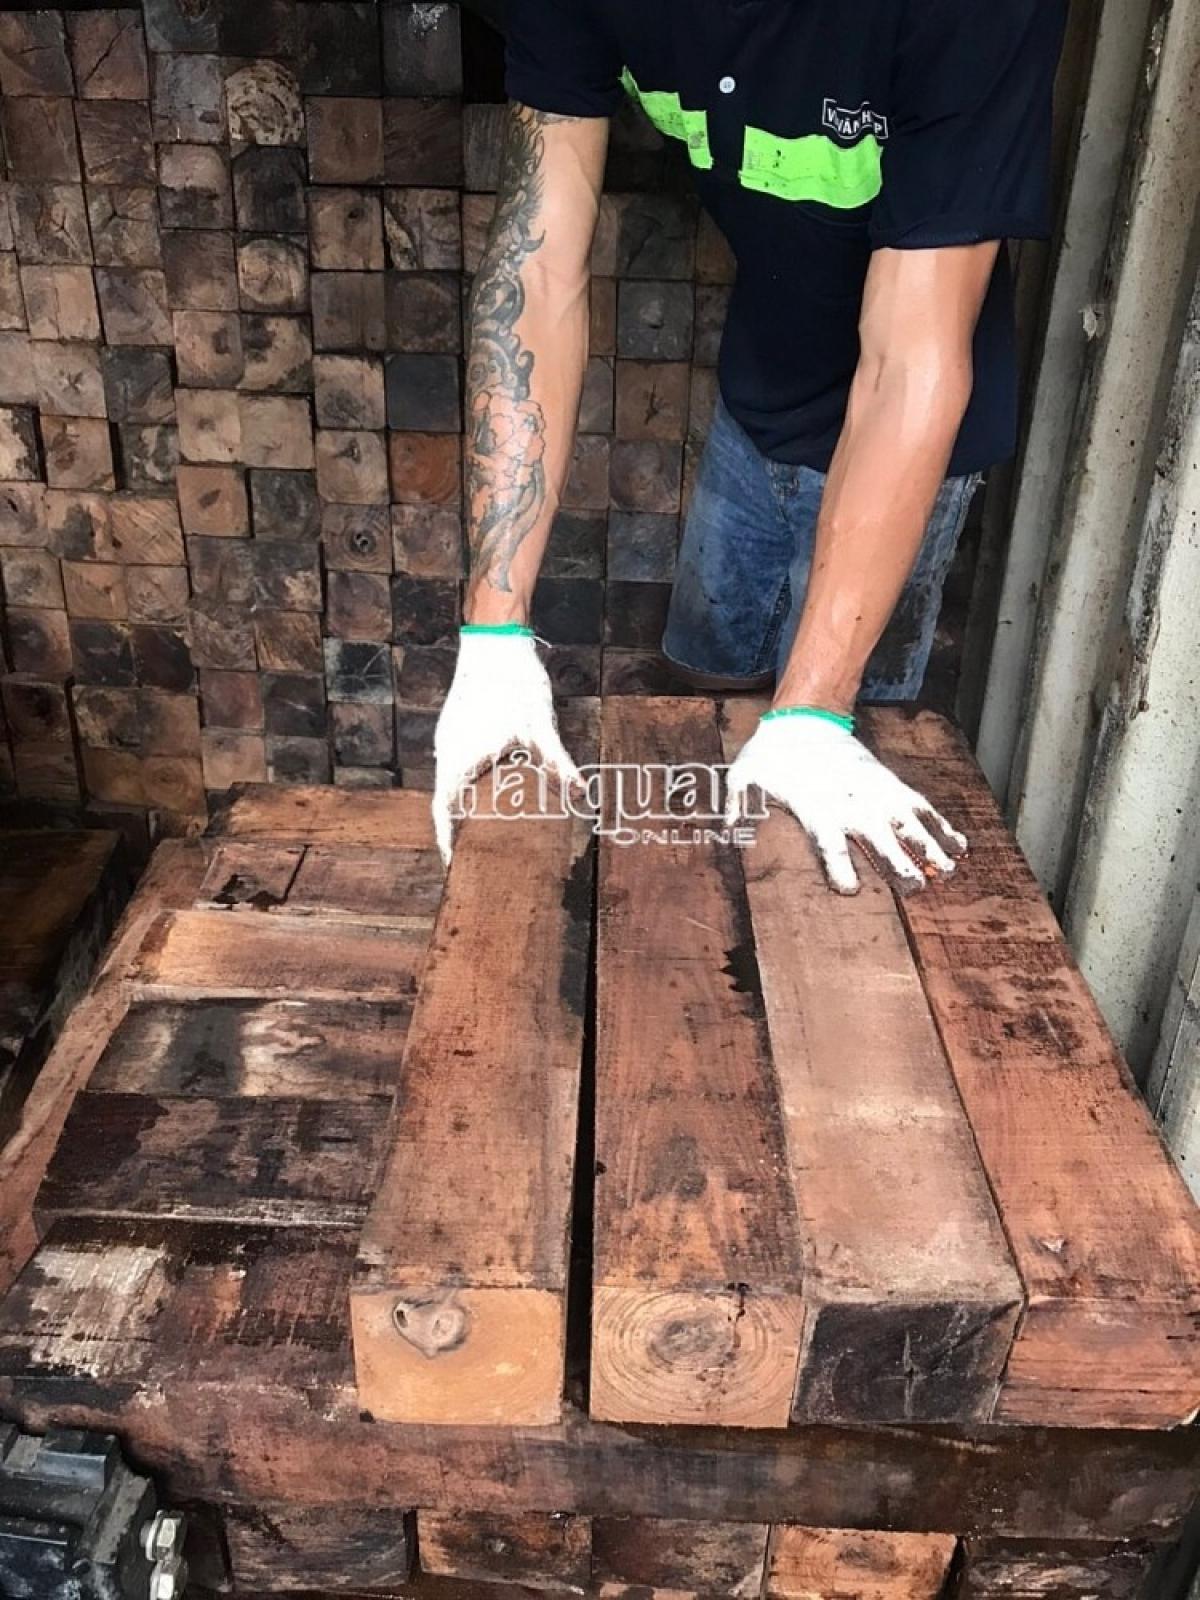 Mỗi container chứa hàng trăm m3 gỗ (Ảnh: Haiquanonline)